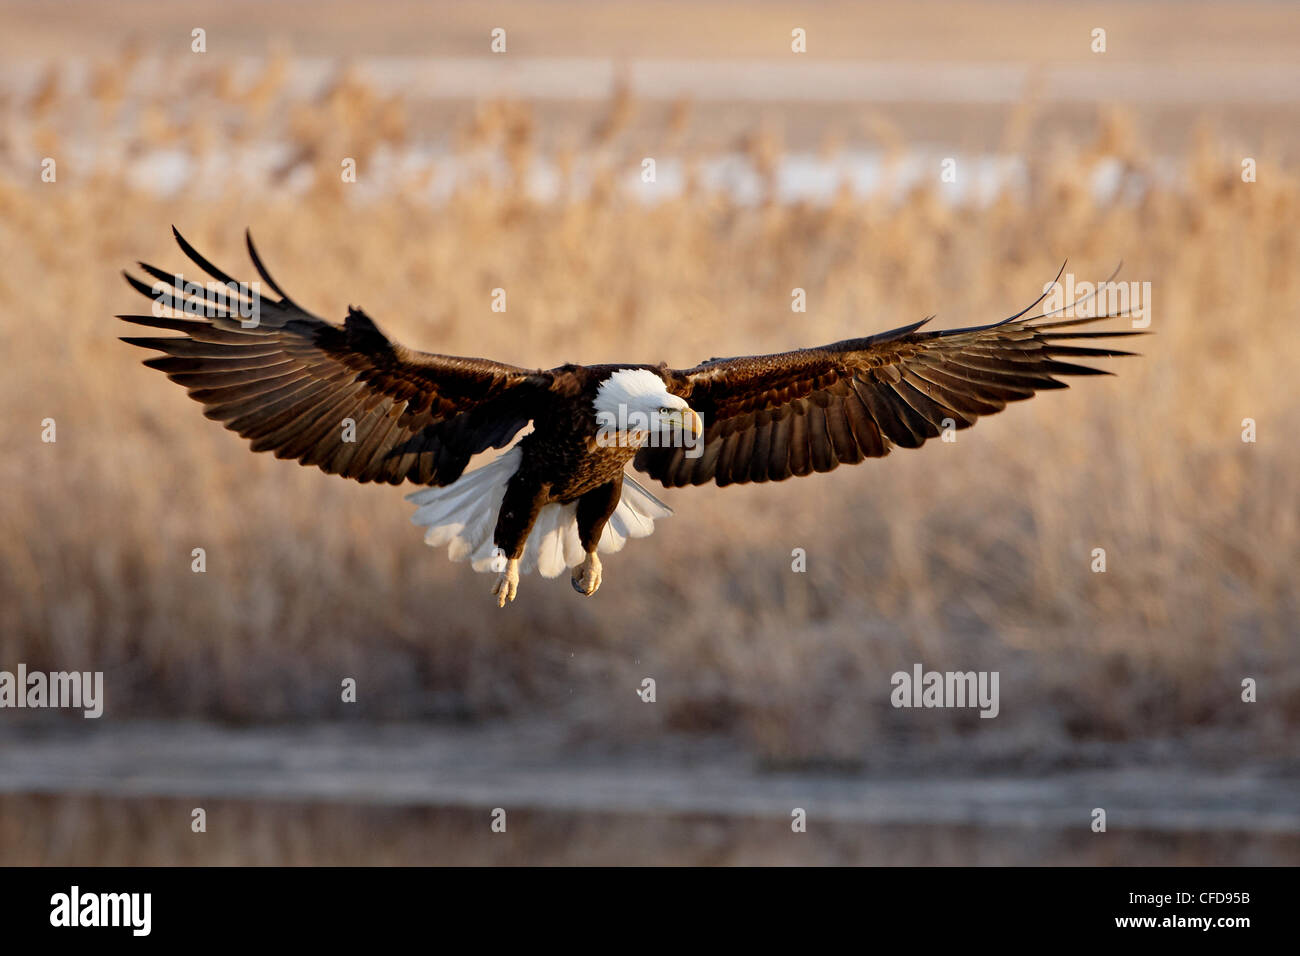 Bald eagle (Haliaeetus leucocephalus) in flight on final approach, Farmington Bay, Utah, United States of America, - Stock Image